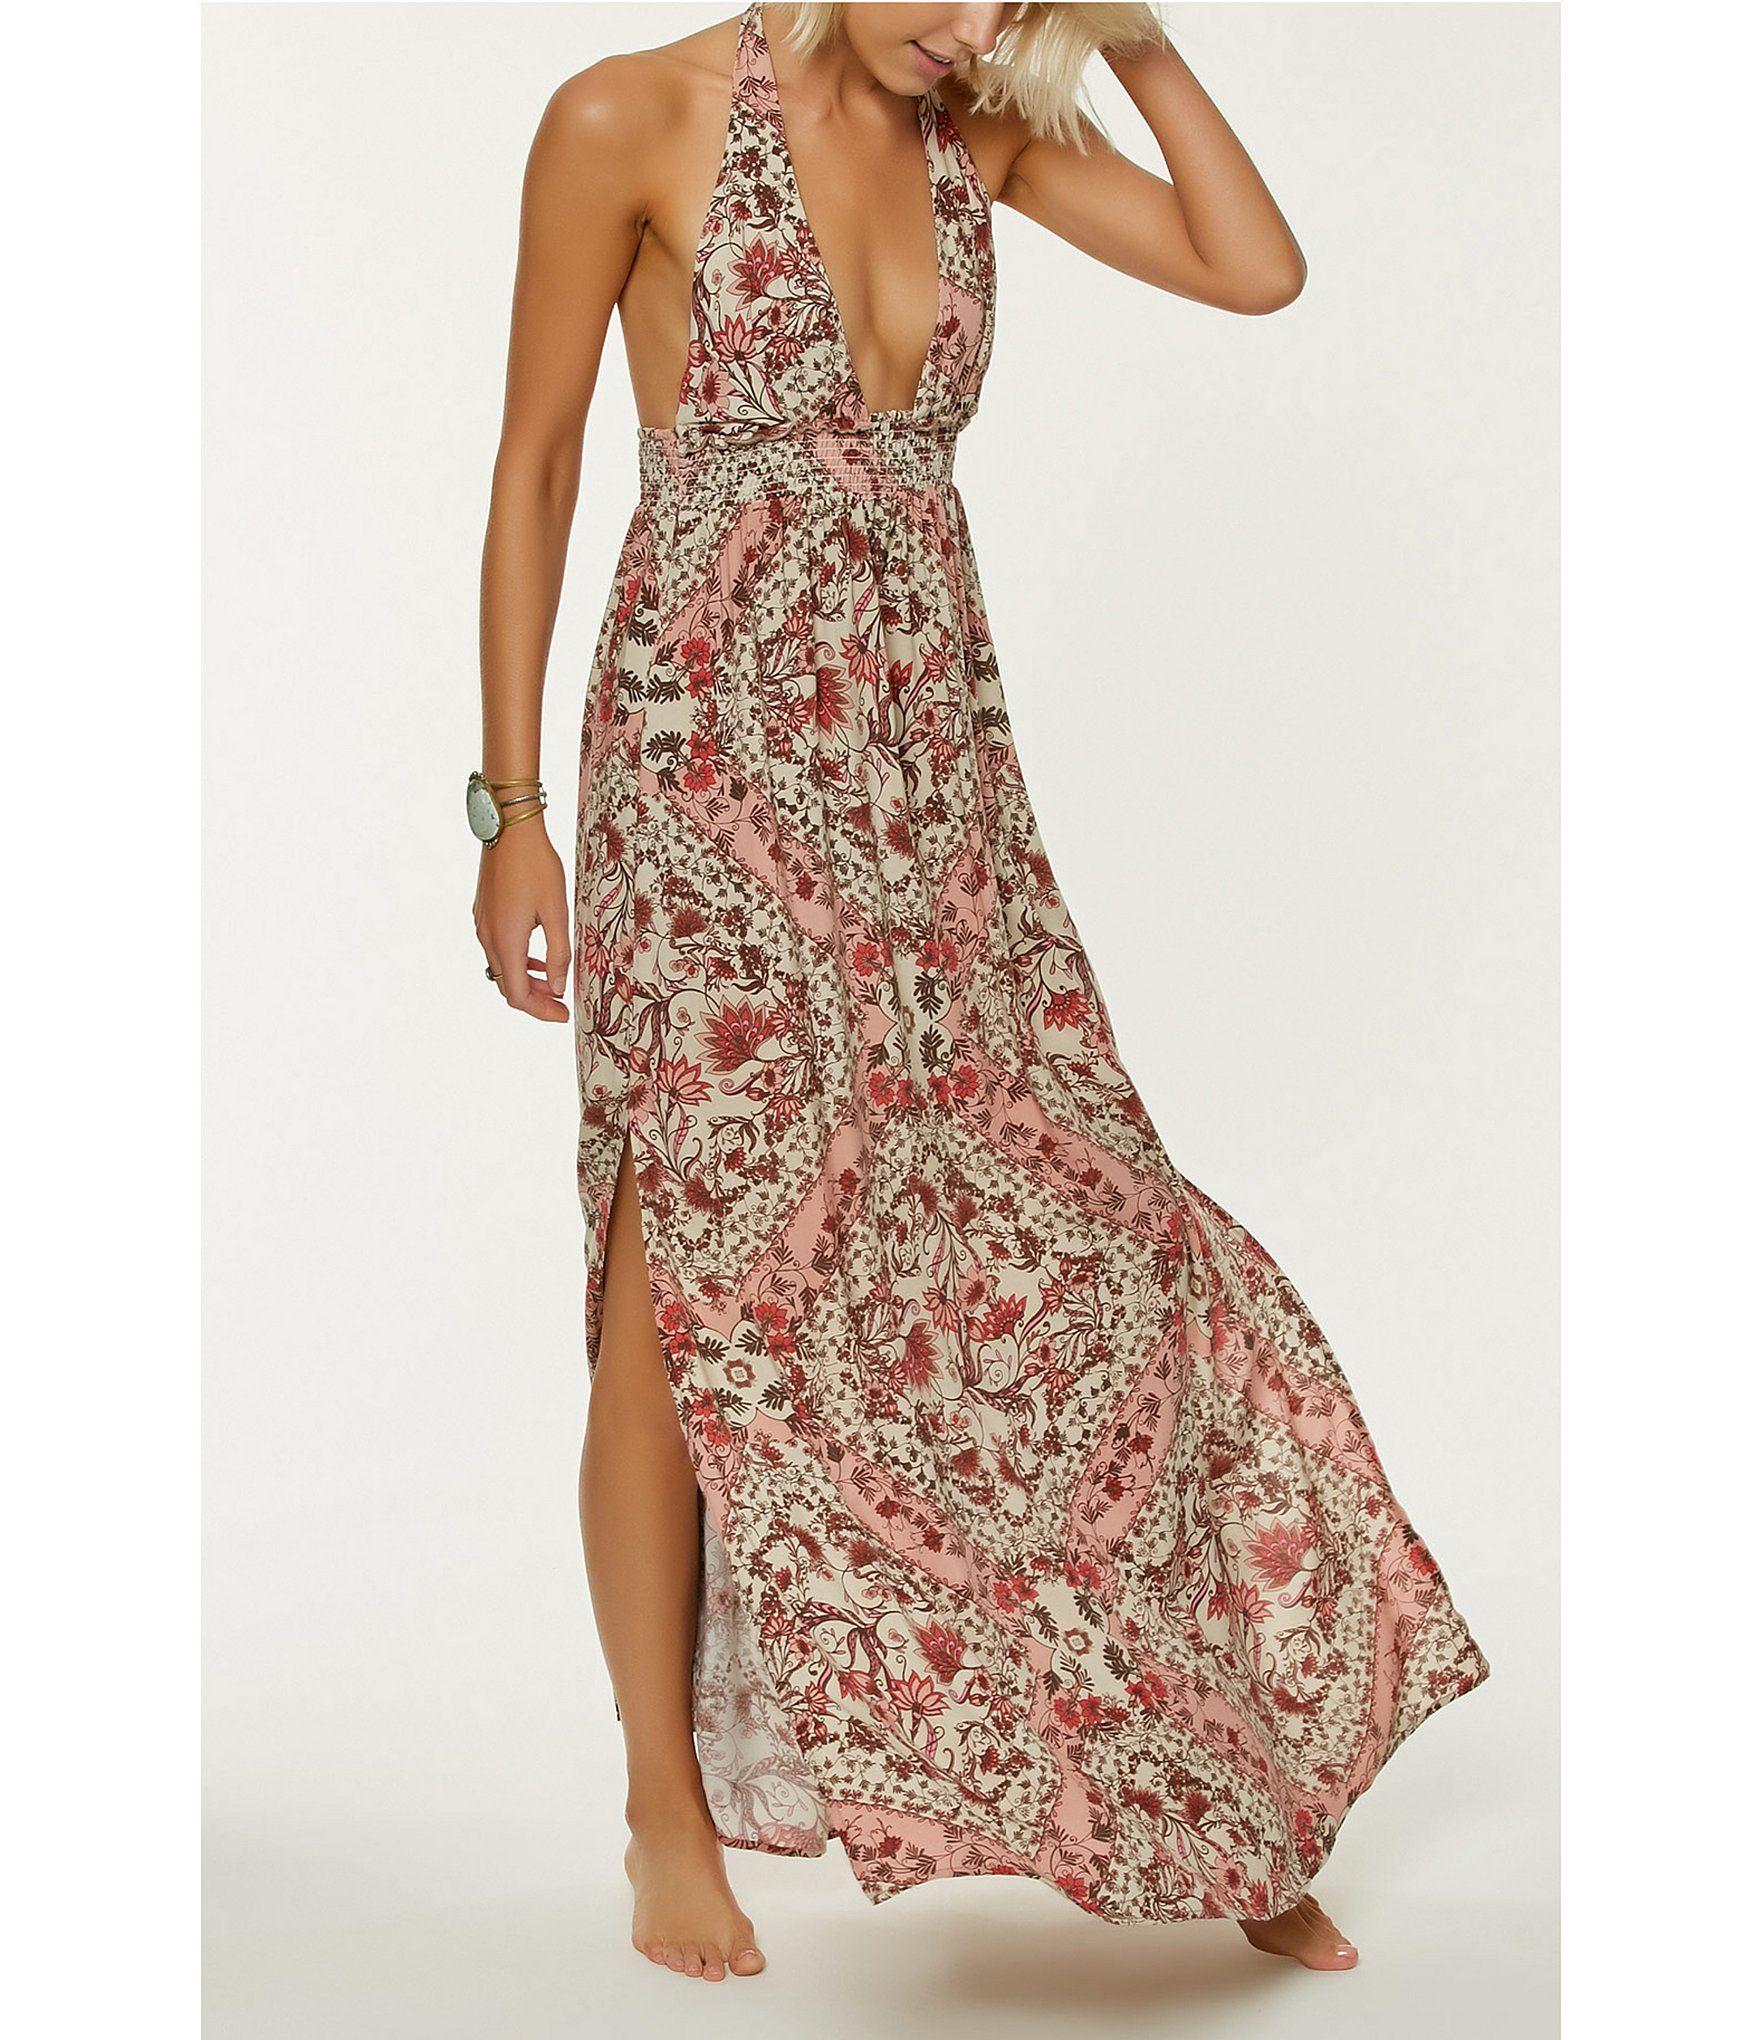 e0c5ea596d2 ONeill Dolley Halter Floral Print Maxi Dress  Dillards Love this dress!!!